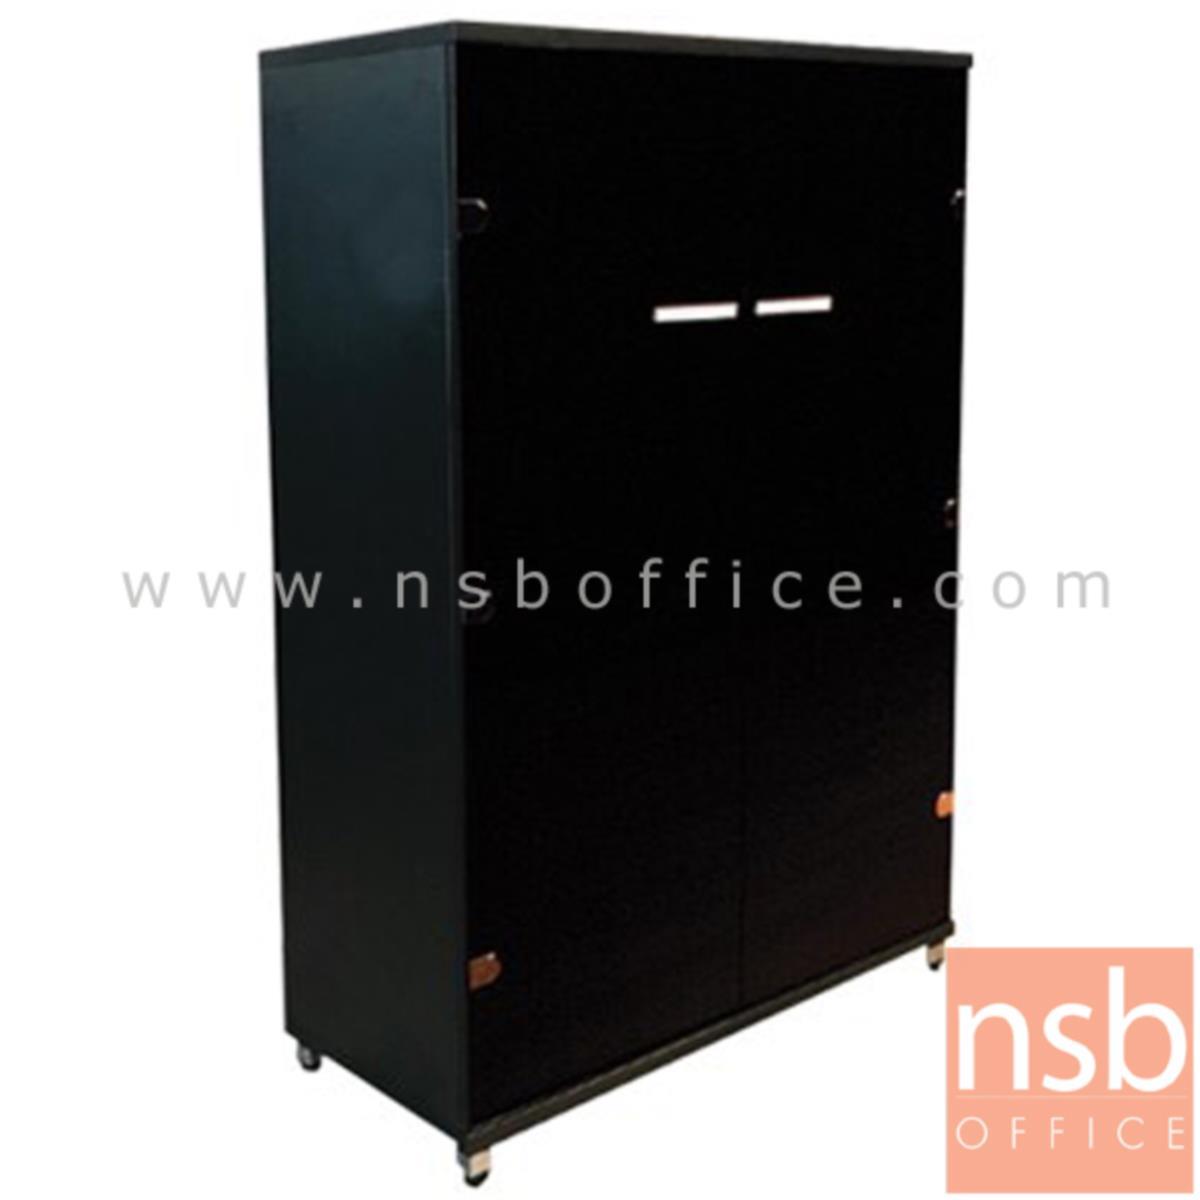 C05A014:ตู้เอกสาร สูง 125 cm. 2 บานเปิดกระจก รุ่น TY-BLACK-GLASS  ขาชุบโครเมี่ยม